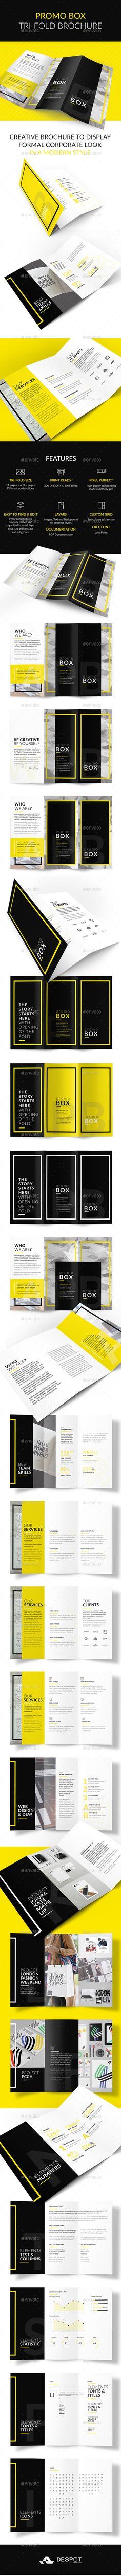 Promo BOX Tri-Fold Brochure  PSD Template • Download ➝ https://graphicriver.net/item/promo-box-trifold-brochure/17041865?ref=pxcr